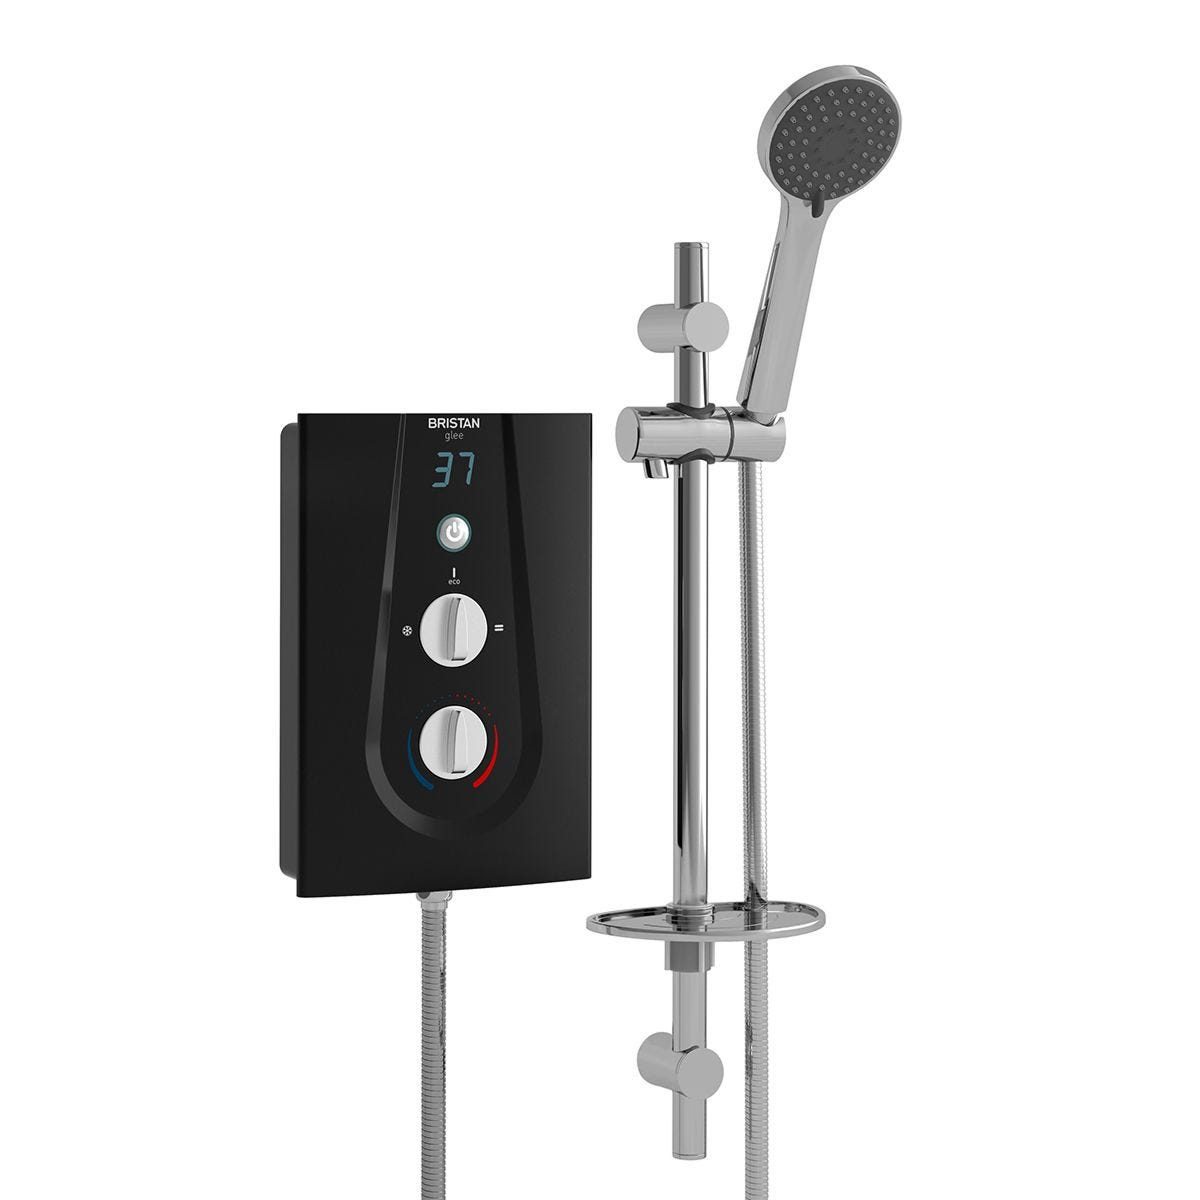 Bristan Glee Electric Shower 10.5kw Black